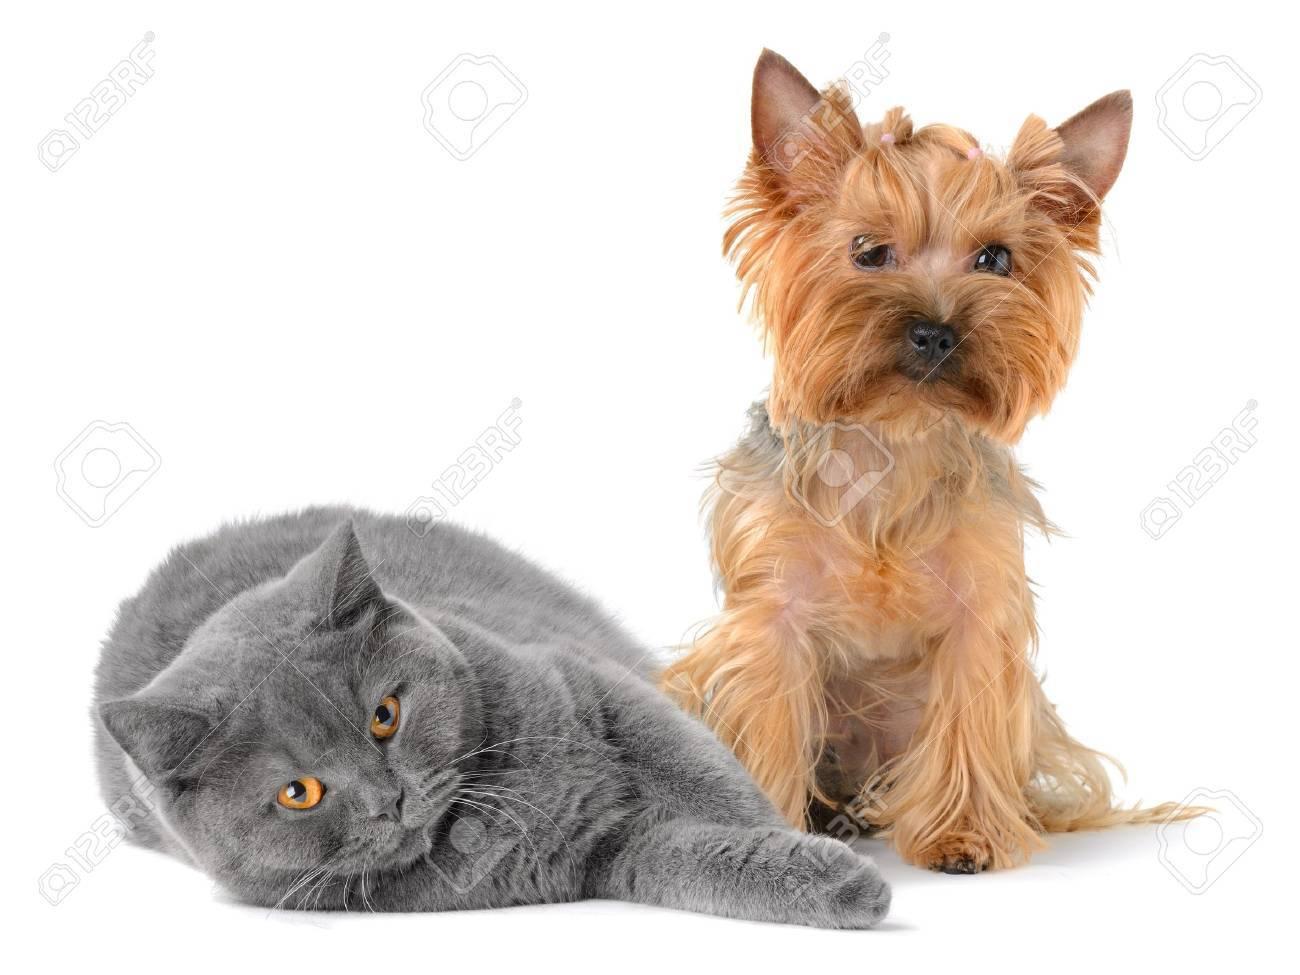 cat and dog isolated on white background Stock Photo - 11157955